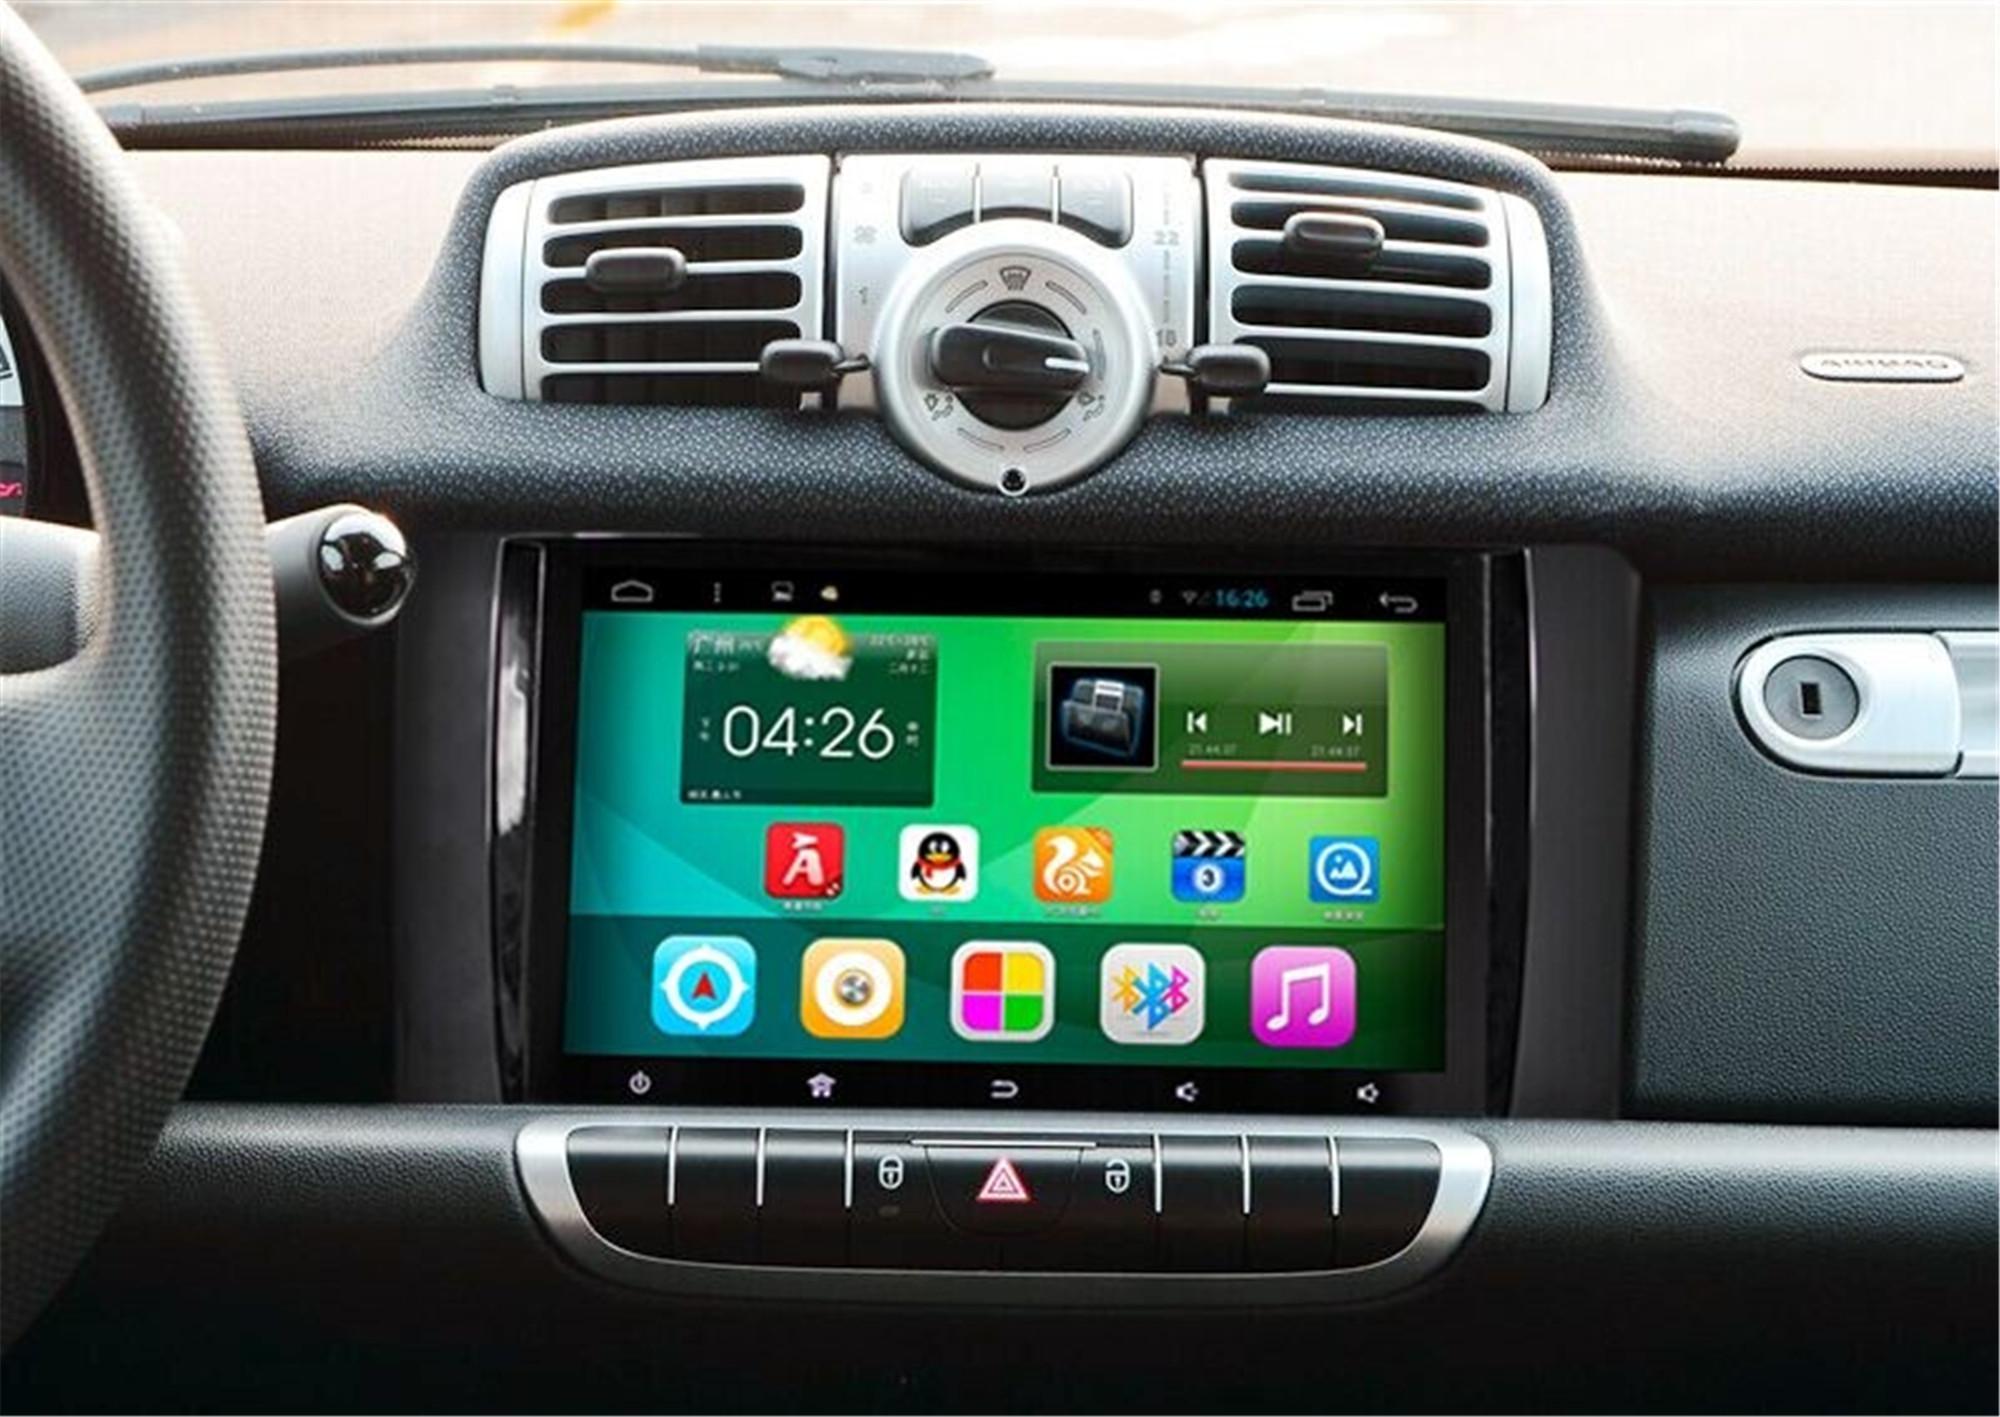 TOPMAVI 9'' Benz Smart Auto Player DVD Navigation GPS 2010-2015 1